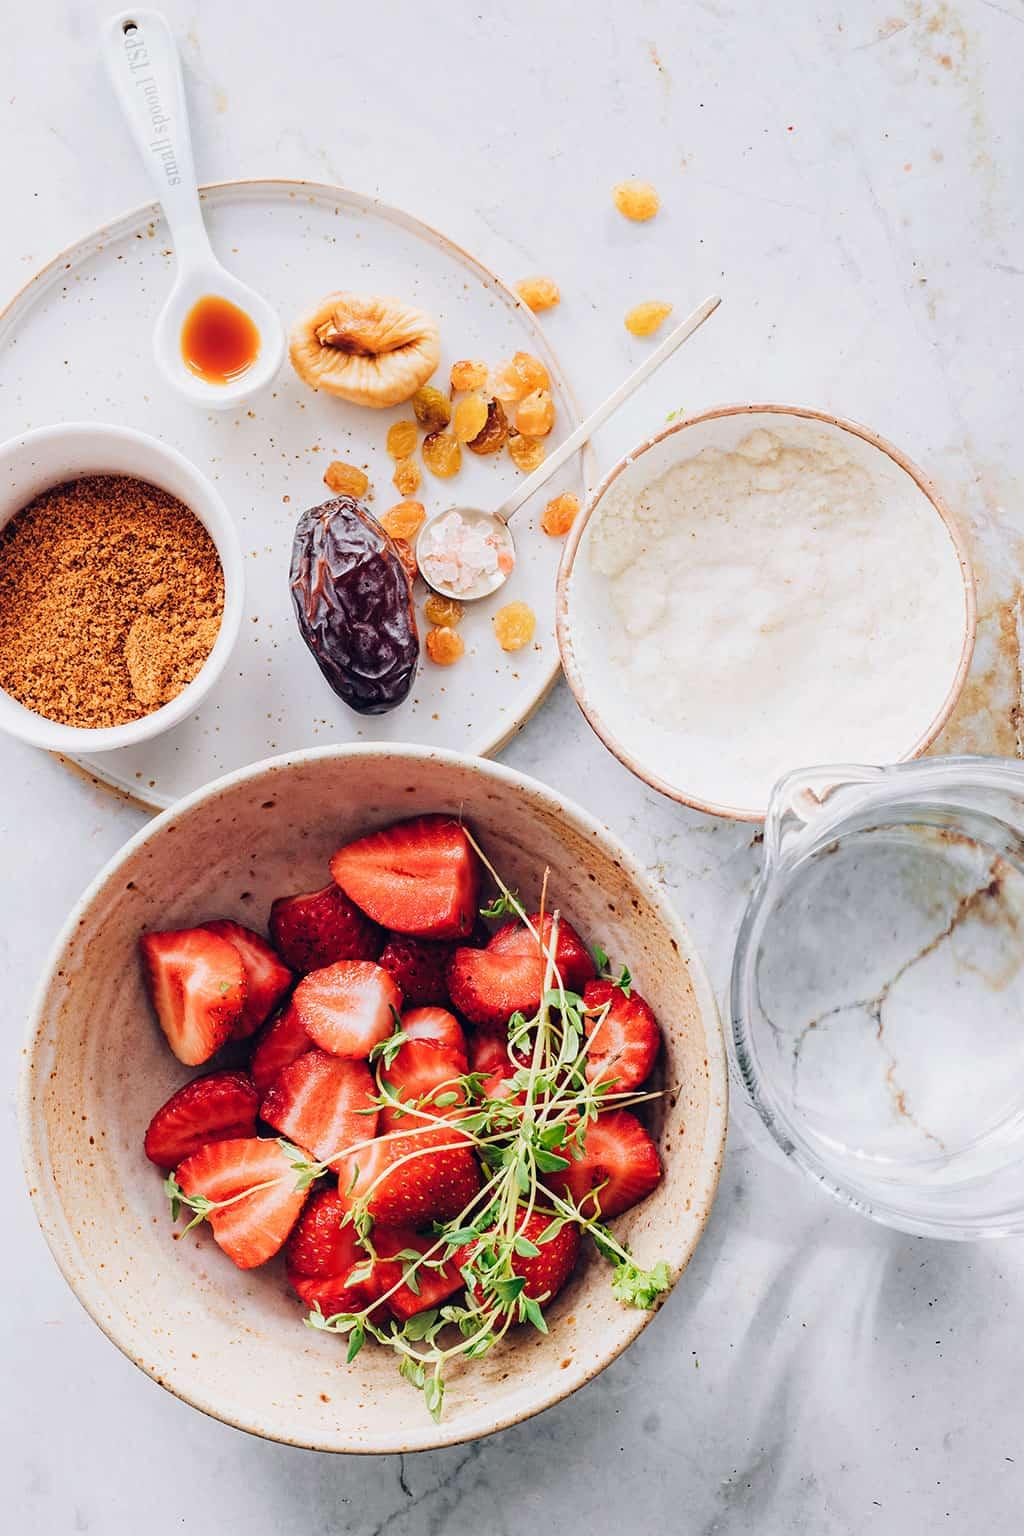 Ingredients for making strawberry thyme water kefir beverage recipe